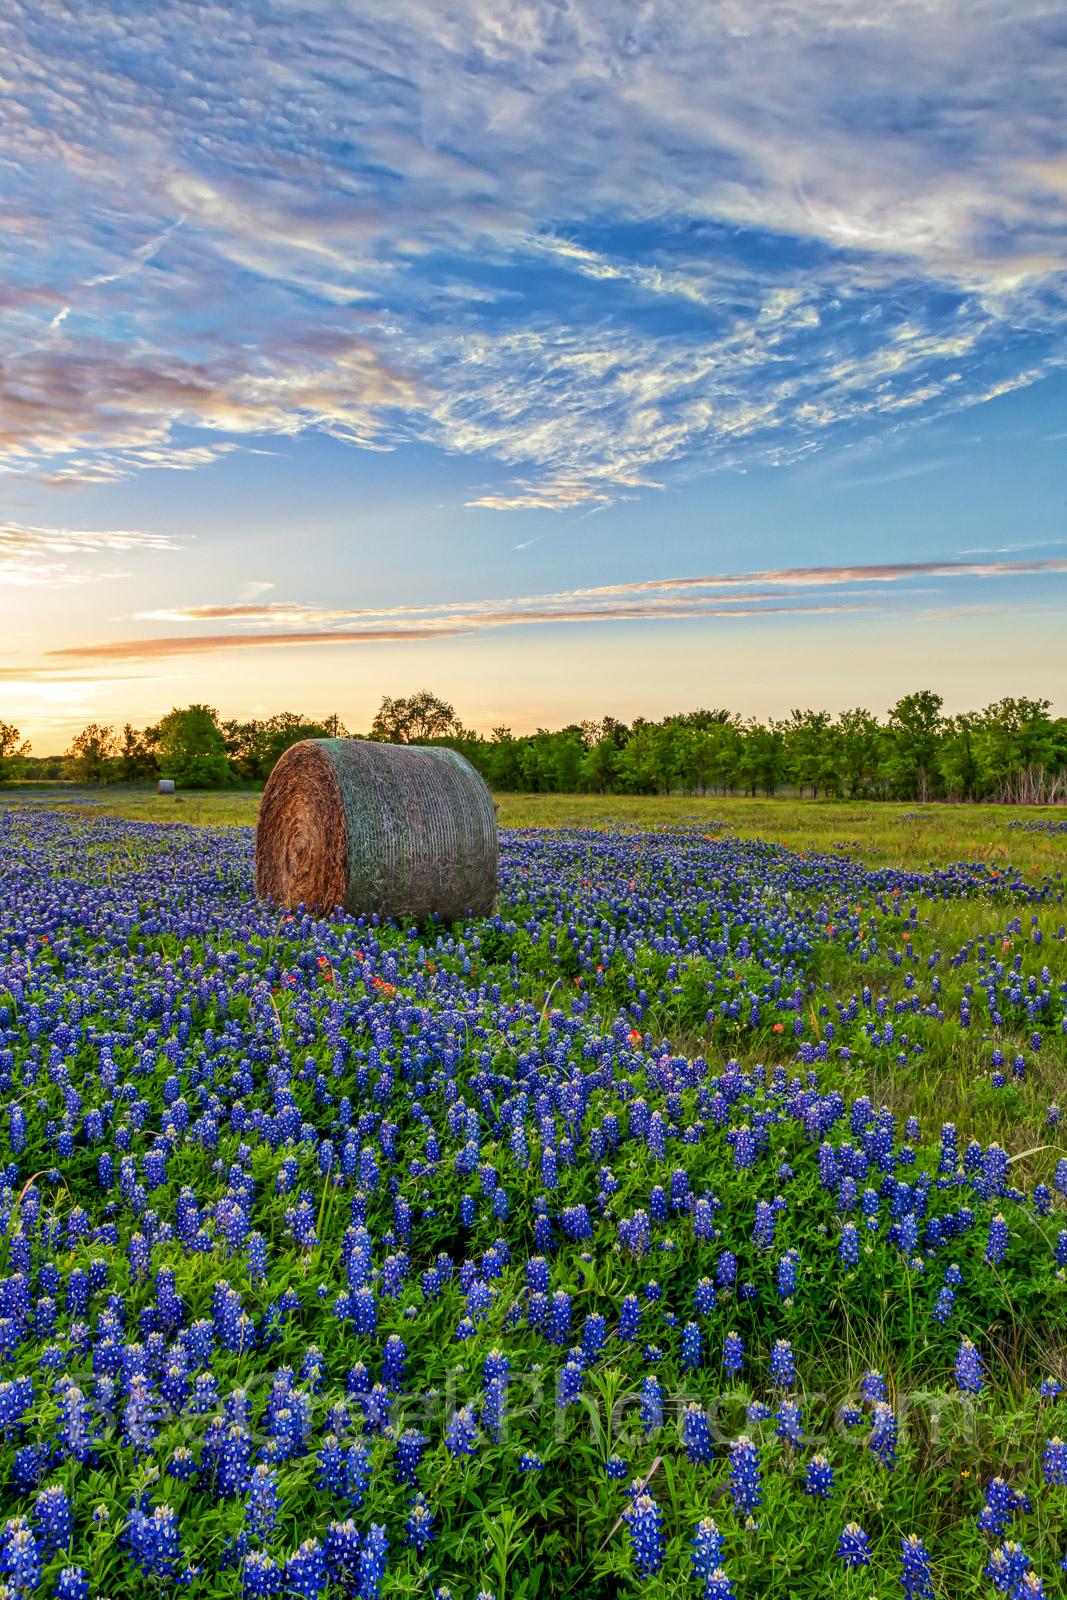 Texas bluebonnets, hay bales, vertical, farm, sun, setting, sky, indian paintbrush, bluebonnet, wildflowers., photo